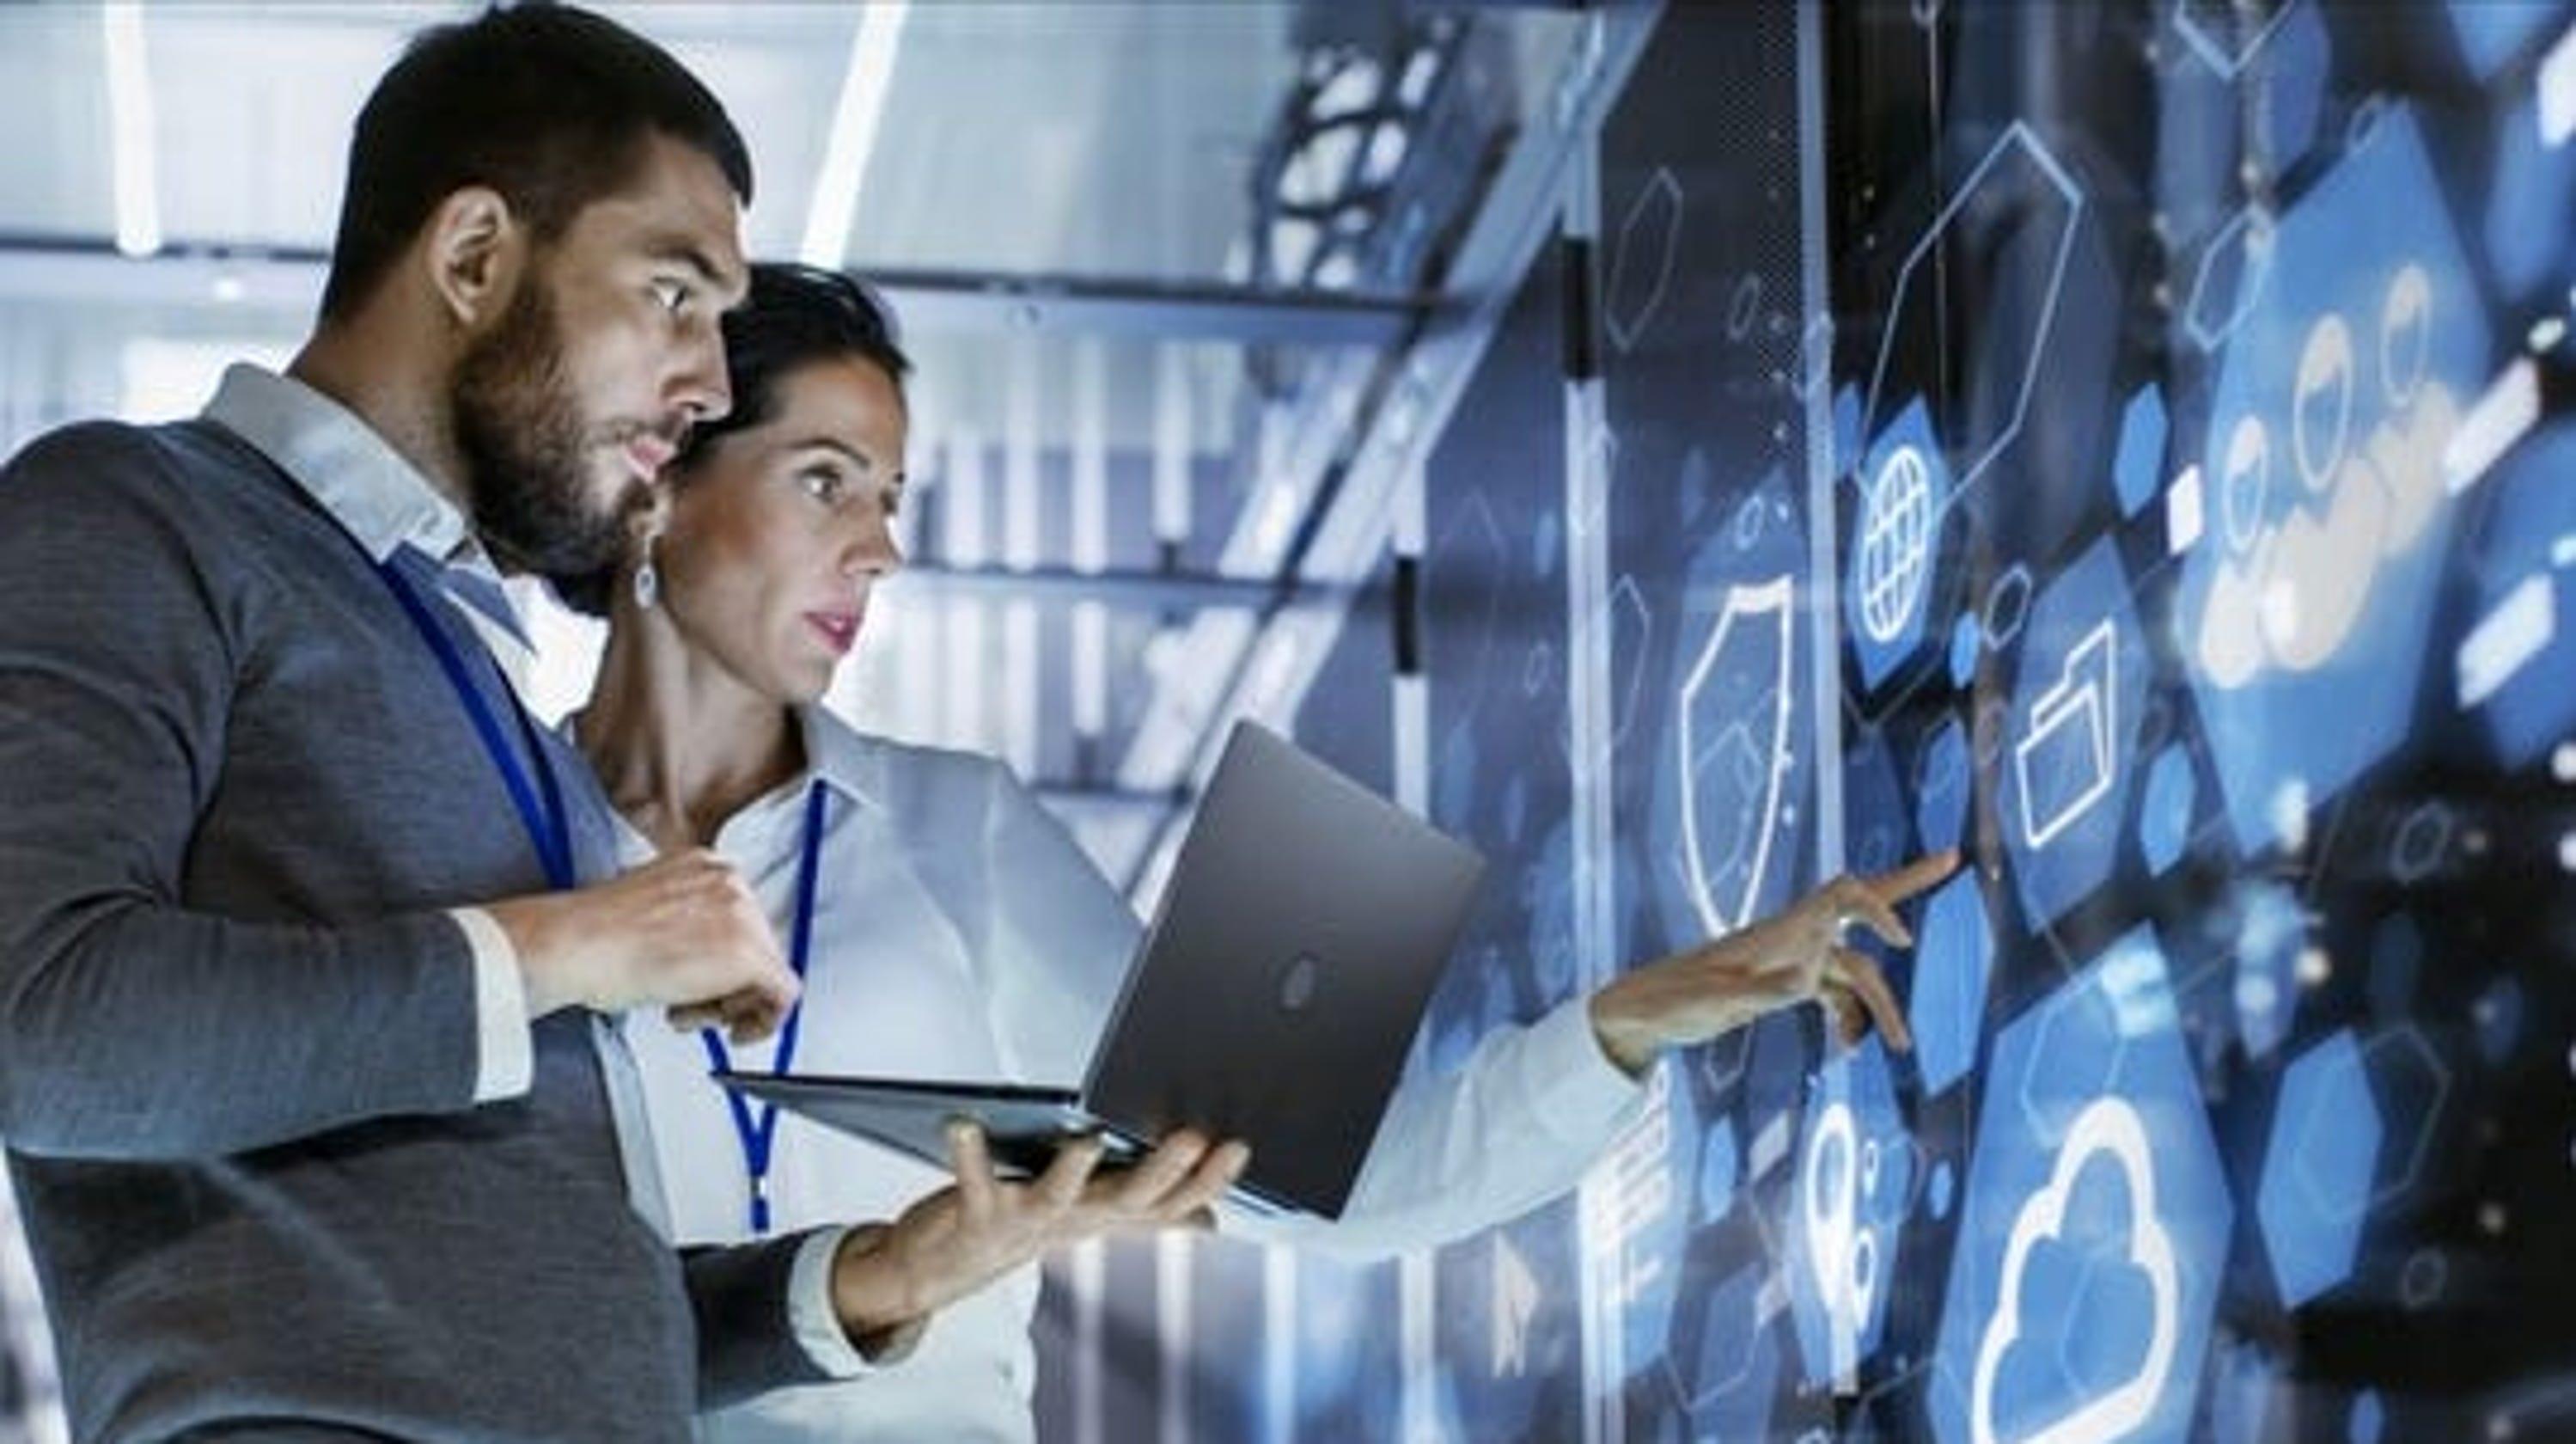 Gen Z salaries: Top paying tech jobs for recent graduates, study